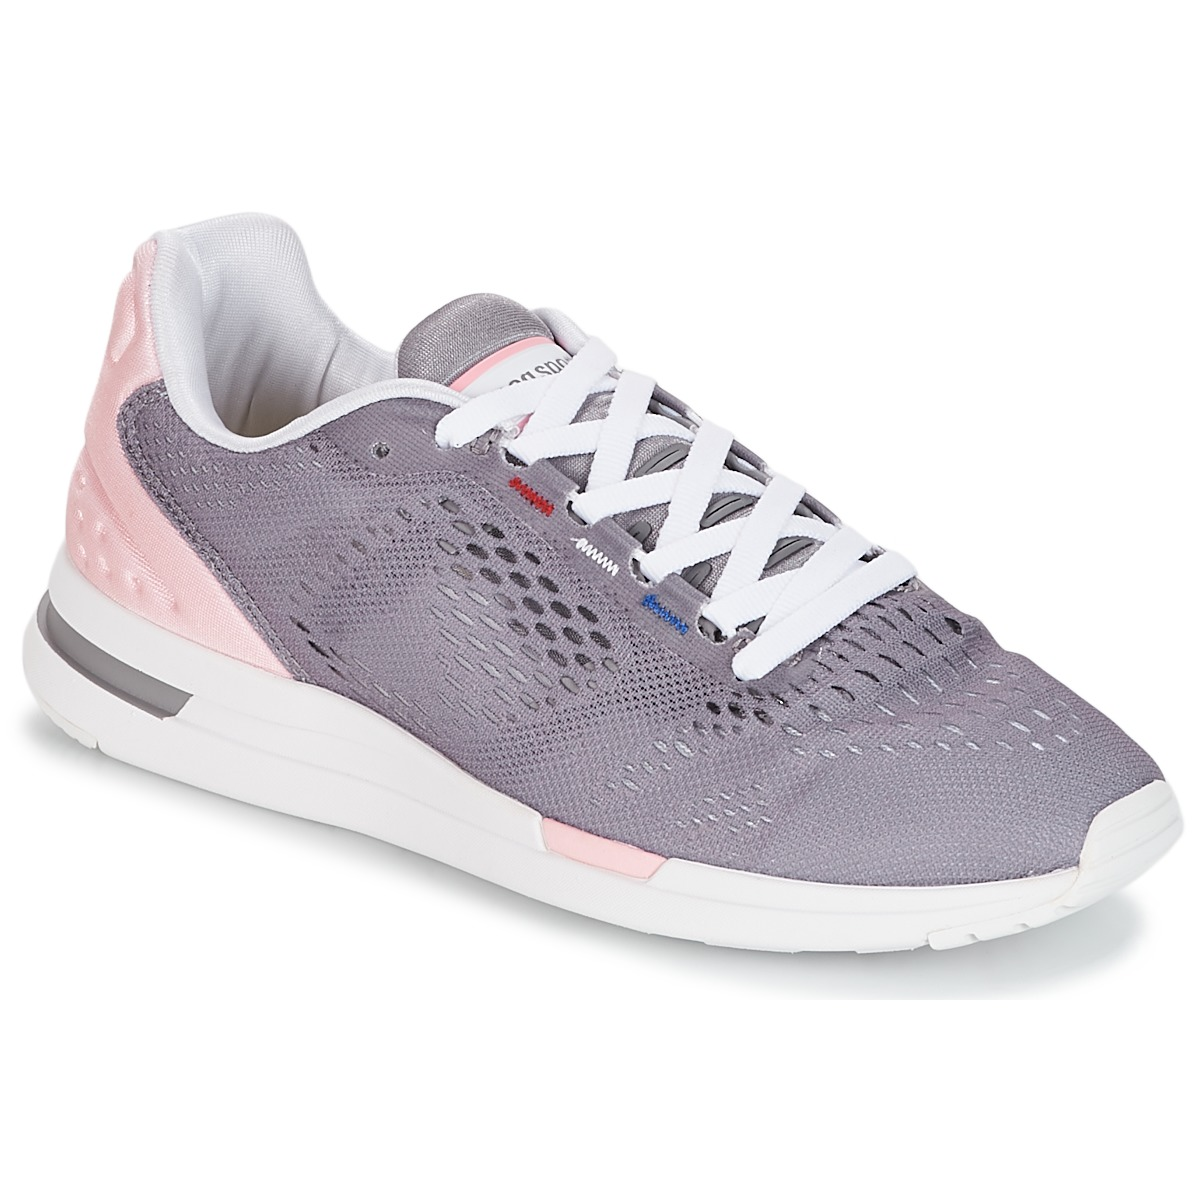 Le Coq Sportif LCS R PRO W ENGINEERED MESH Violett - Kostenloser Versand bei Spartoode ! - Schuhe Sneaker Low Damen 83,30 €